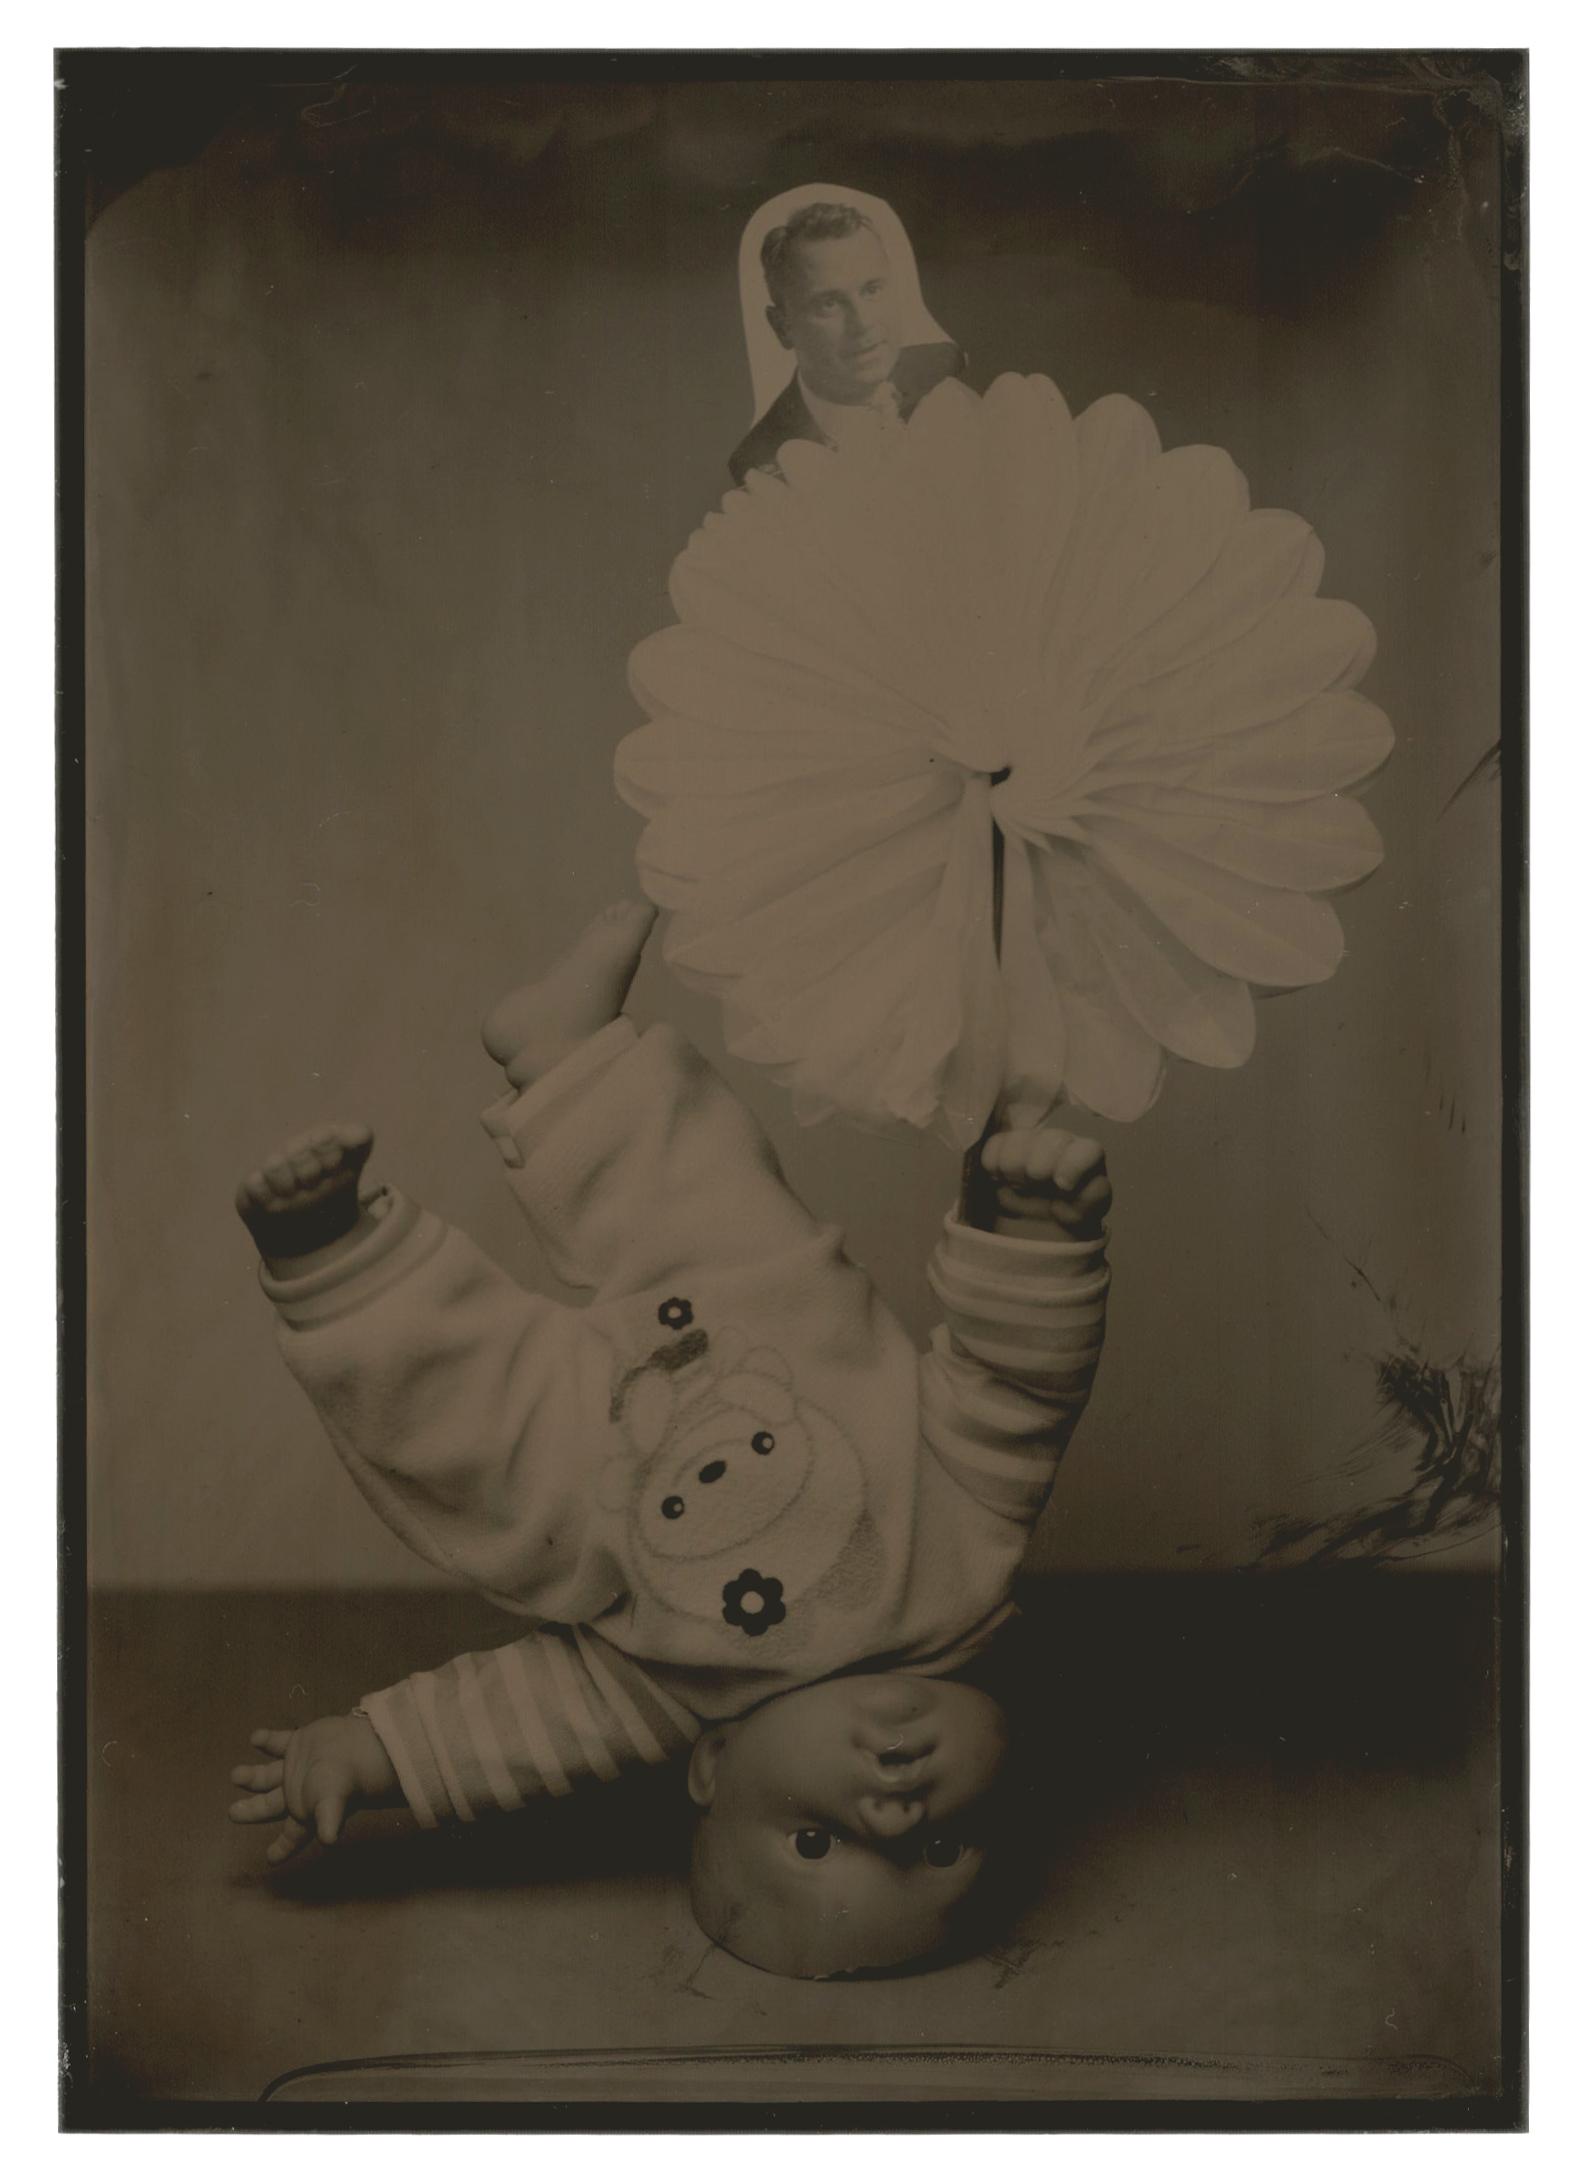 Body by Body, Zanni #11, 2016, tintype, 7 x 5 in. (17 3/4 x 12 3/4 cm.), unique, Château Shatto, Los Angeles